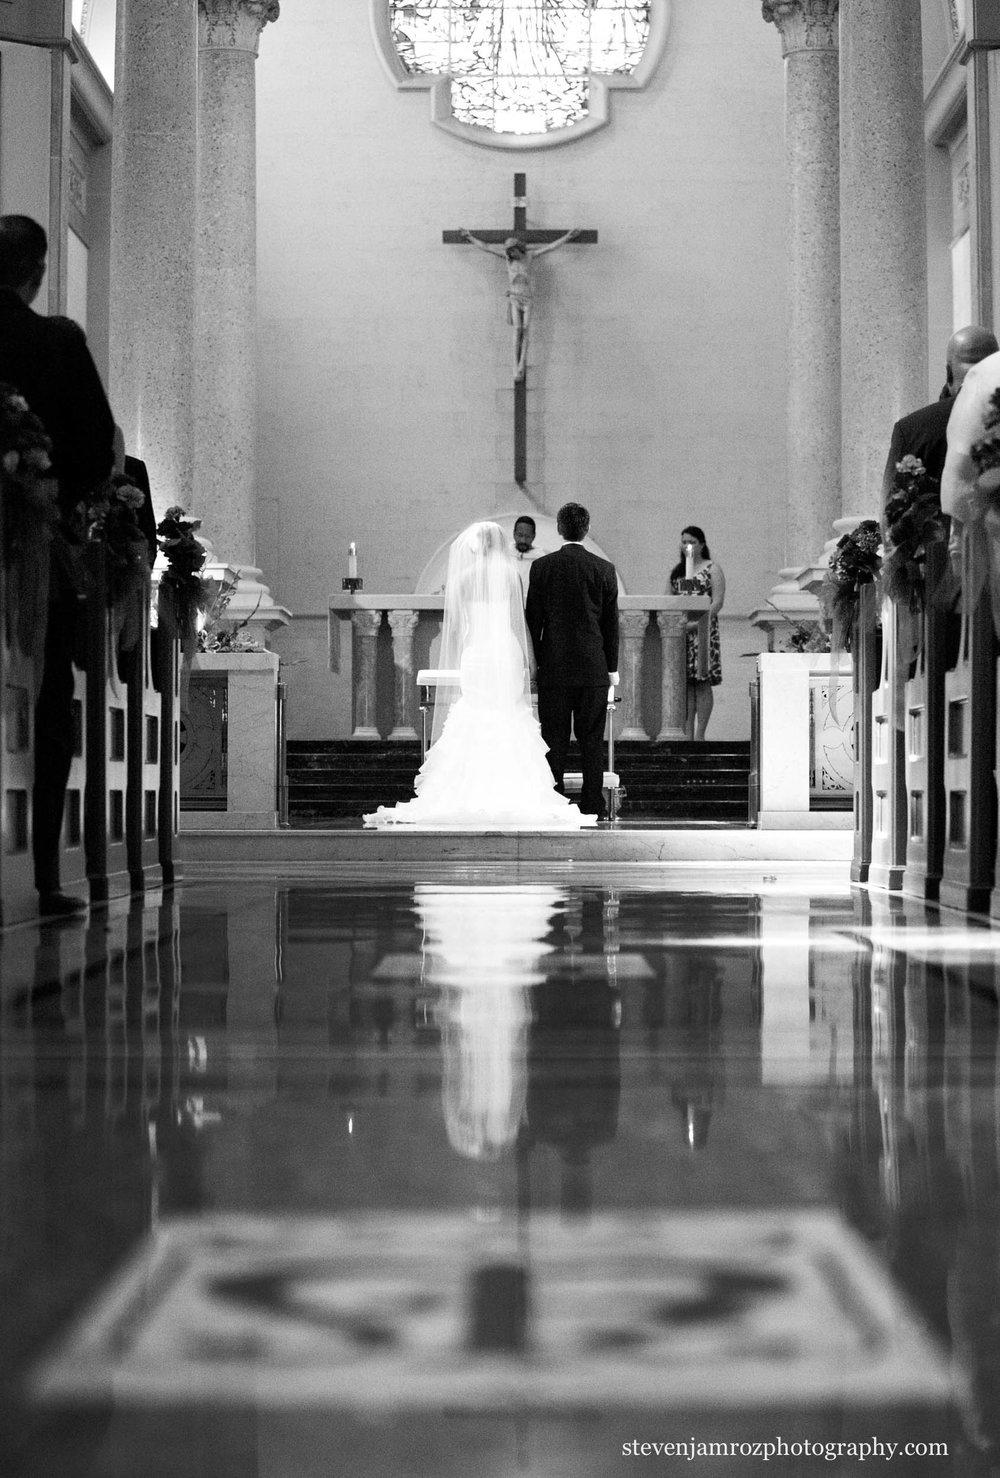 church-wedding-reflection-floor-raleigh-wedding-photos-steven-jamroz-0726.jpg